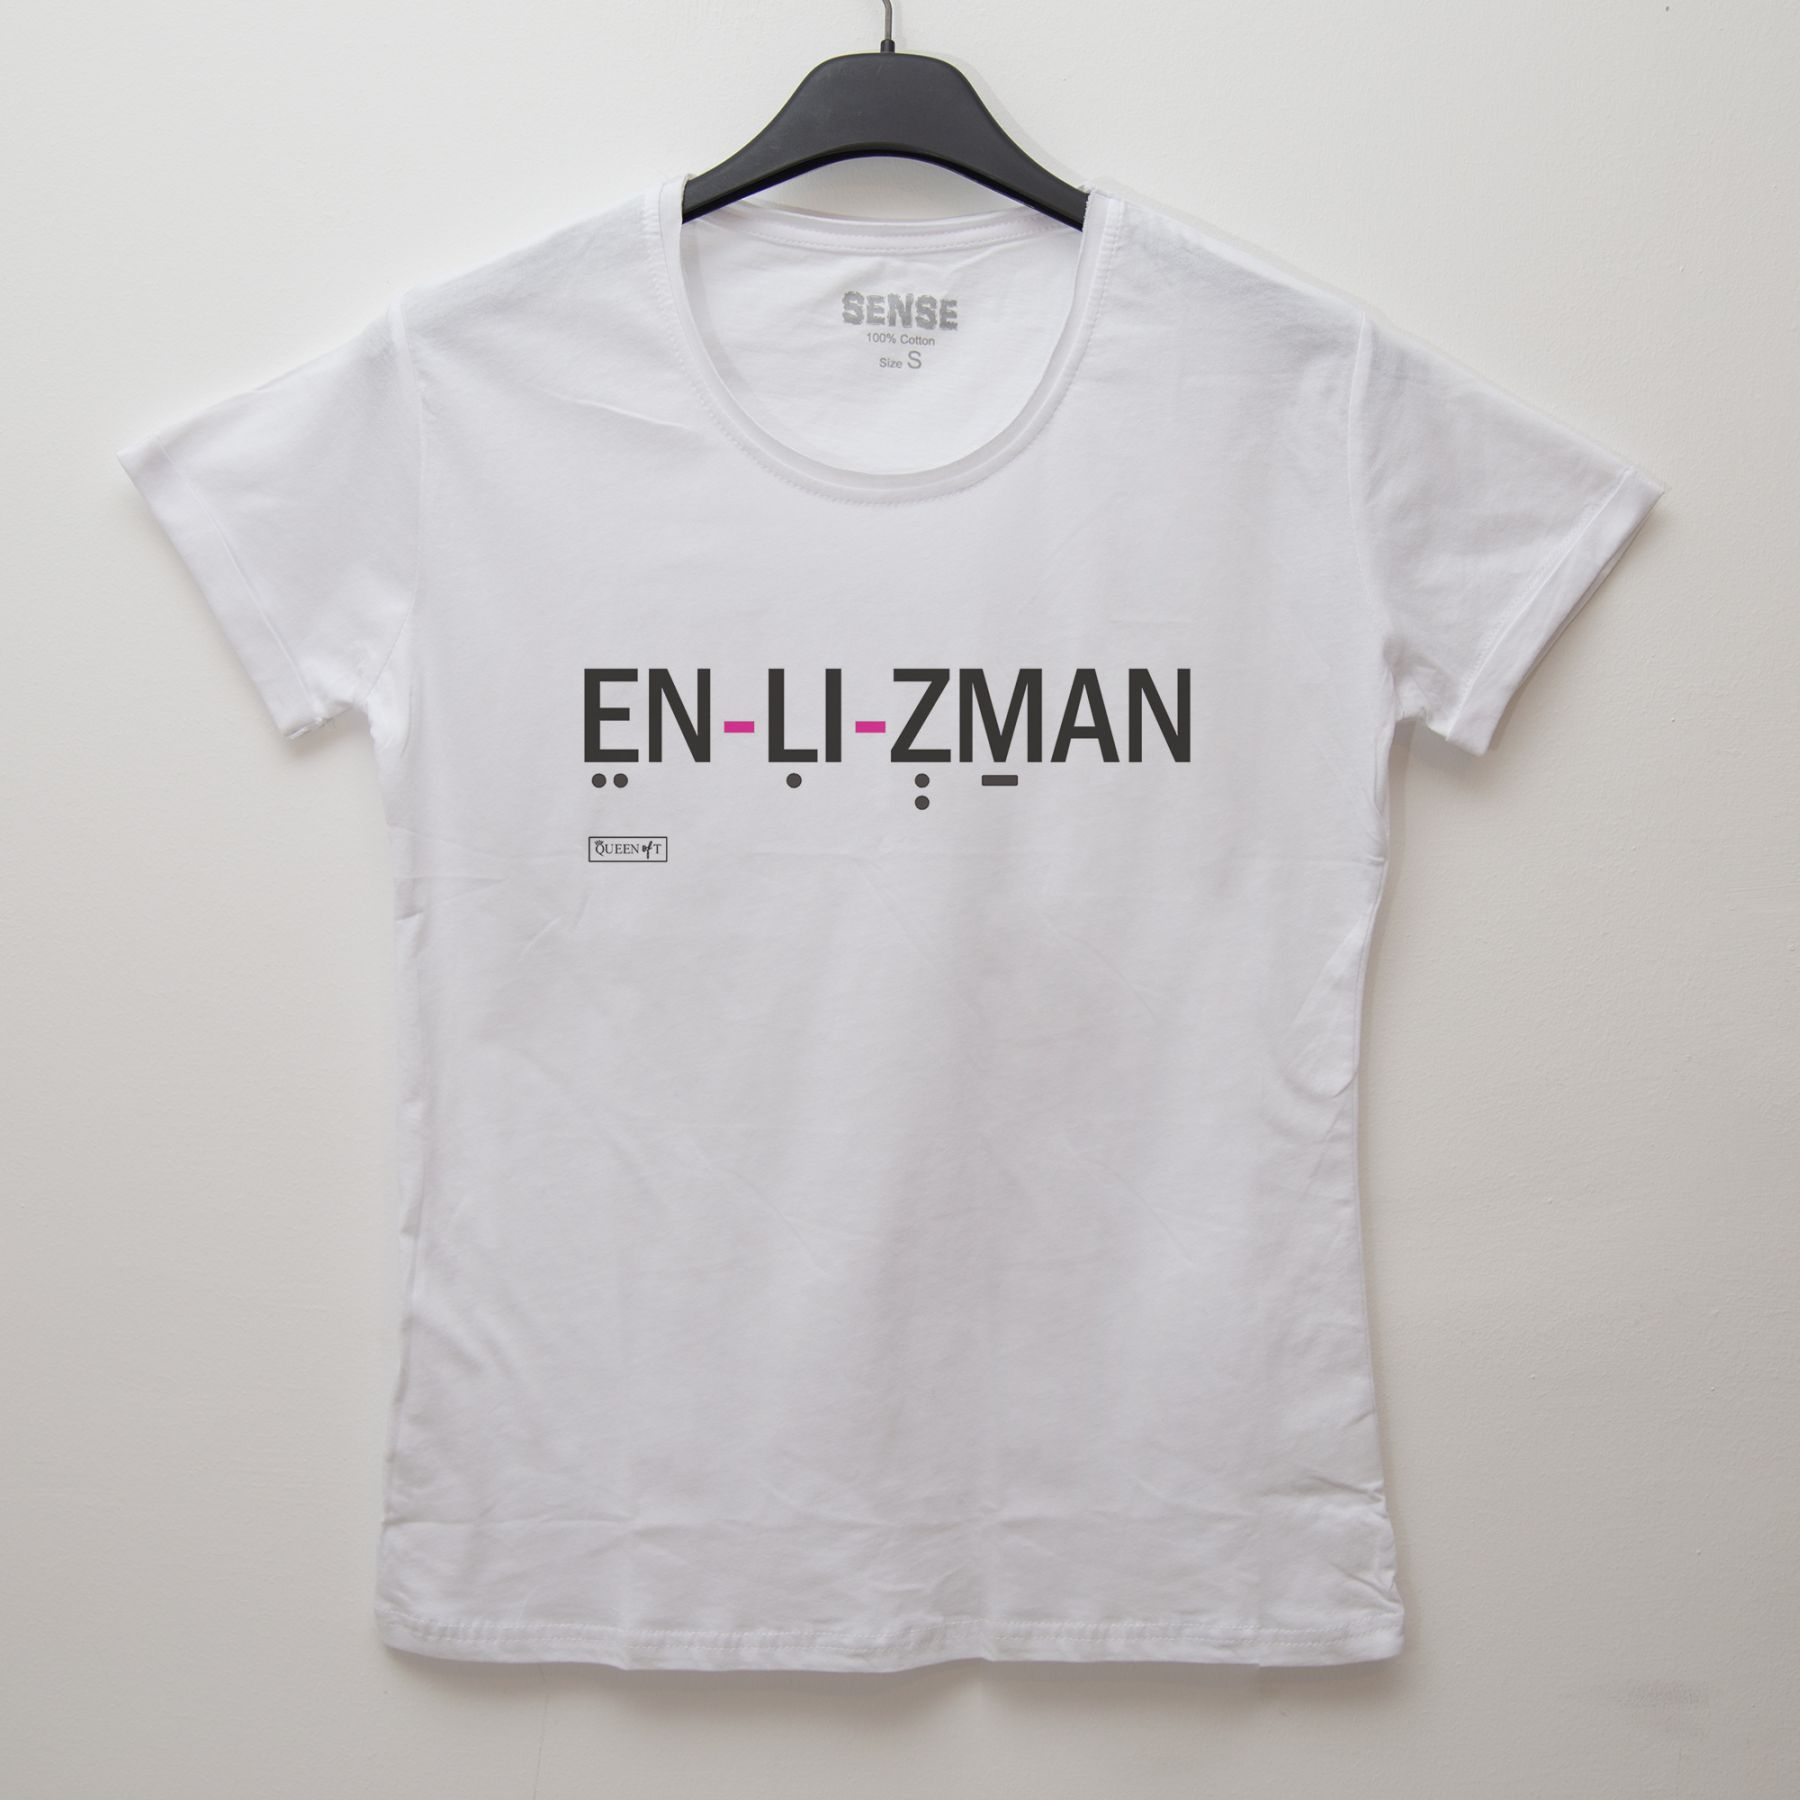 EN-LI-ZMAN - Tshirt